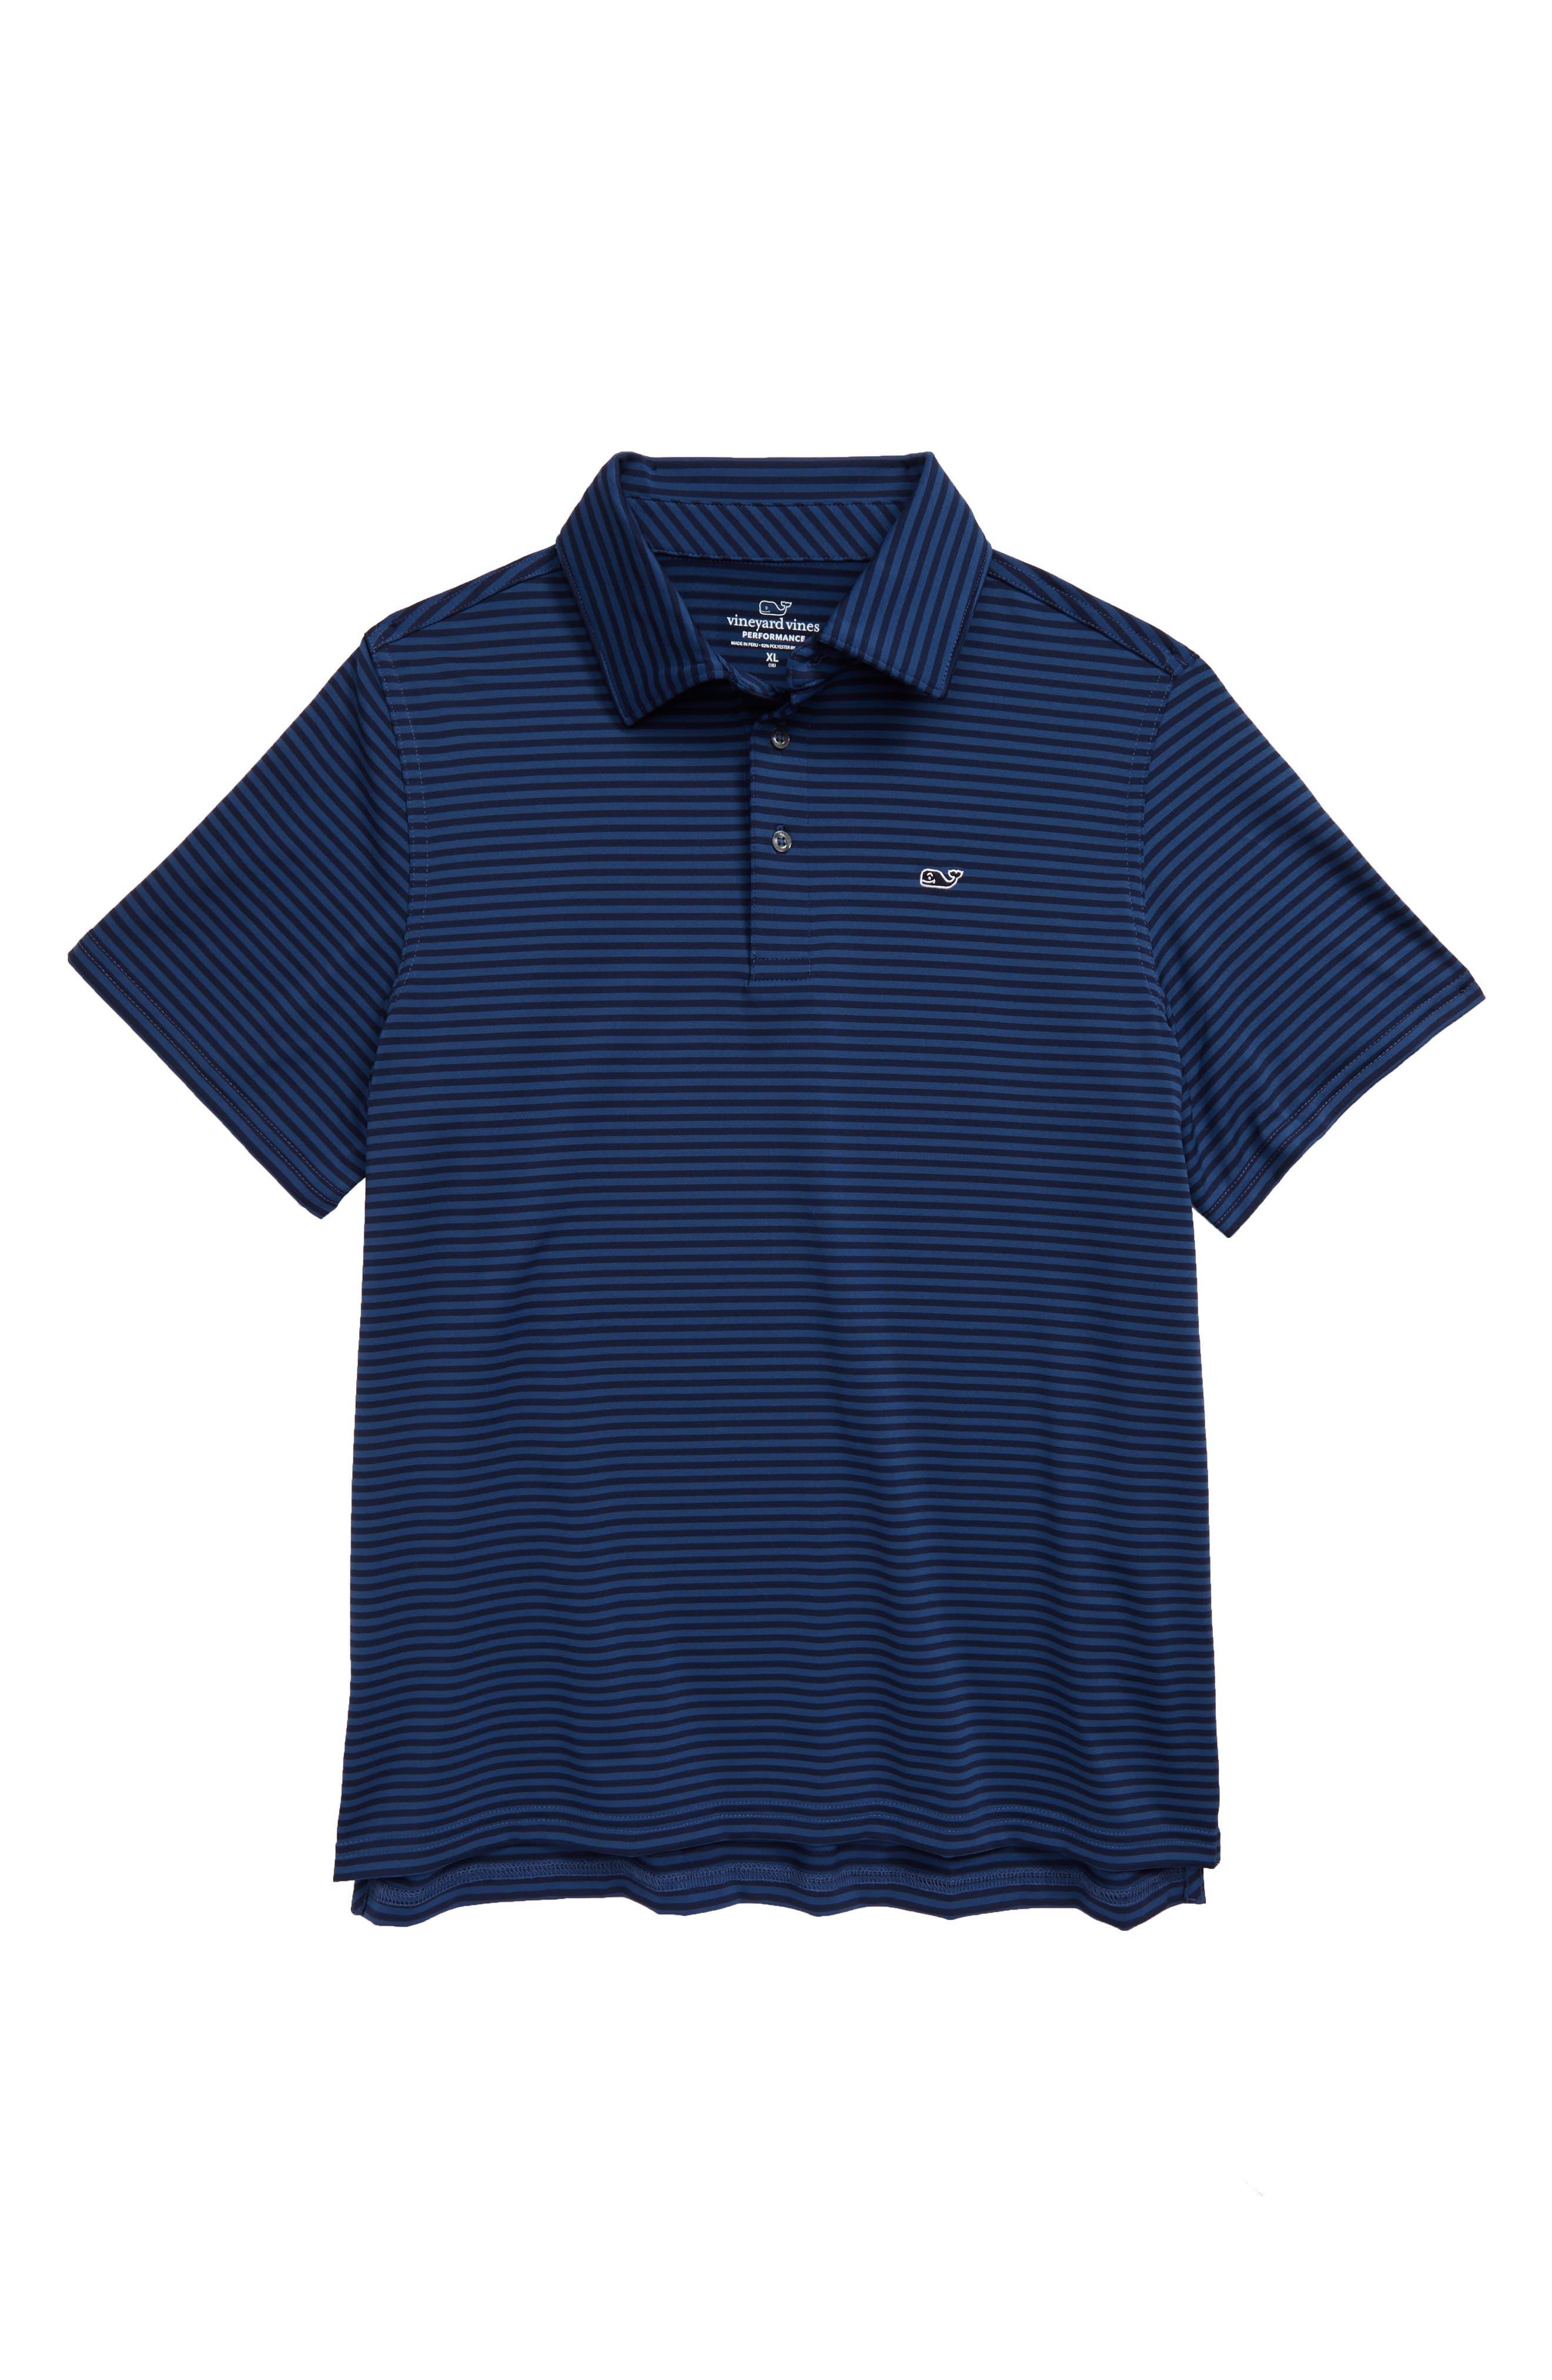 2583aa9f5 Boys' Vineyard Vines Clothing: Hoodies, Shirts, Pants & T-Shirts | Nordstrom